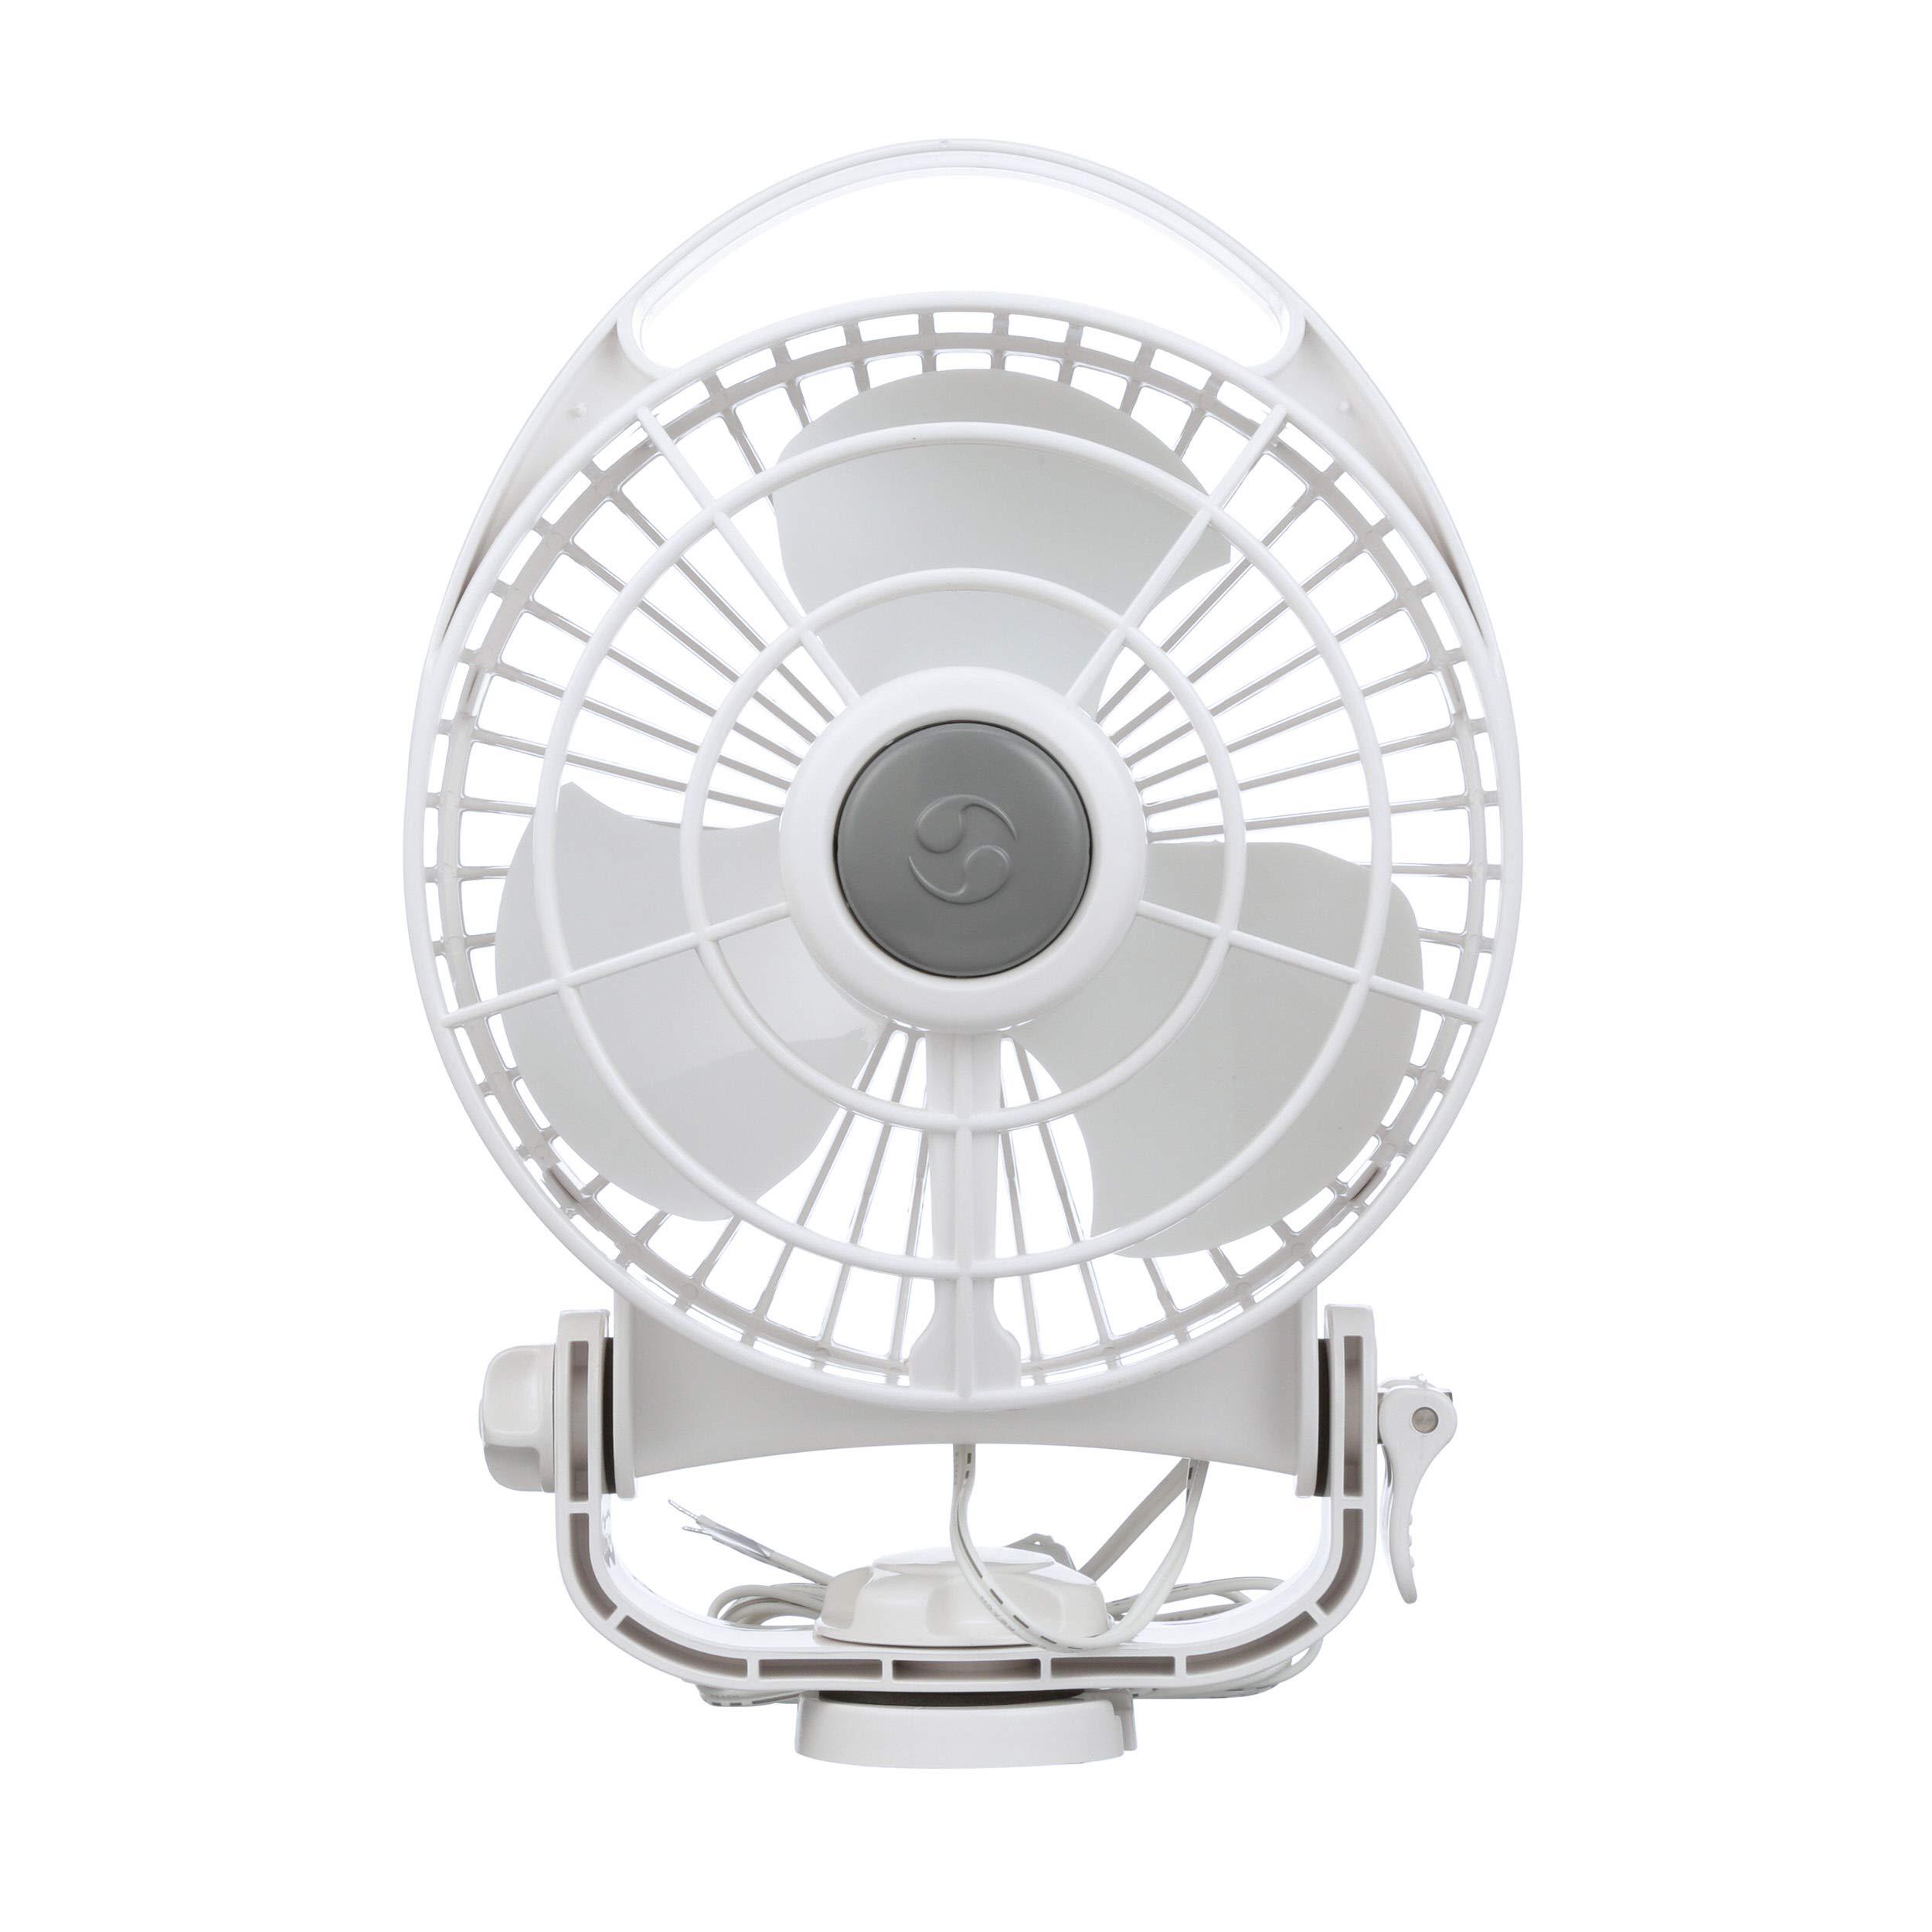 Caframo Bora. 12V Marine Fan. Direct Wire, Low Draw, 5000 Hour Motor Life. White by Caframo Marine